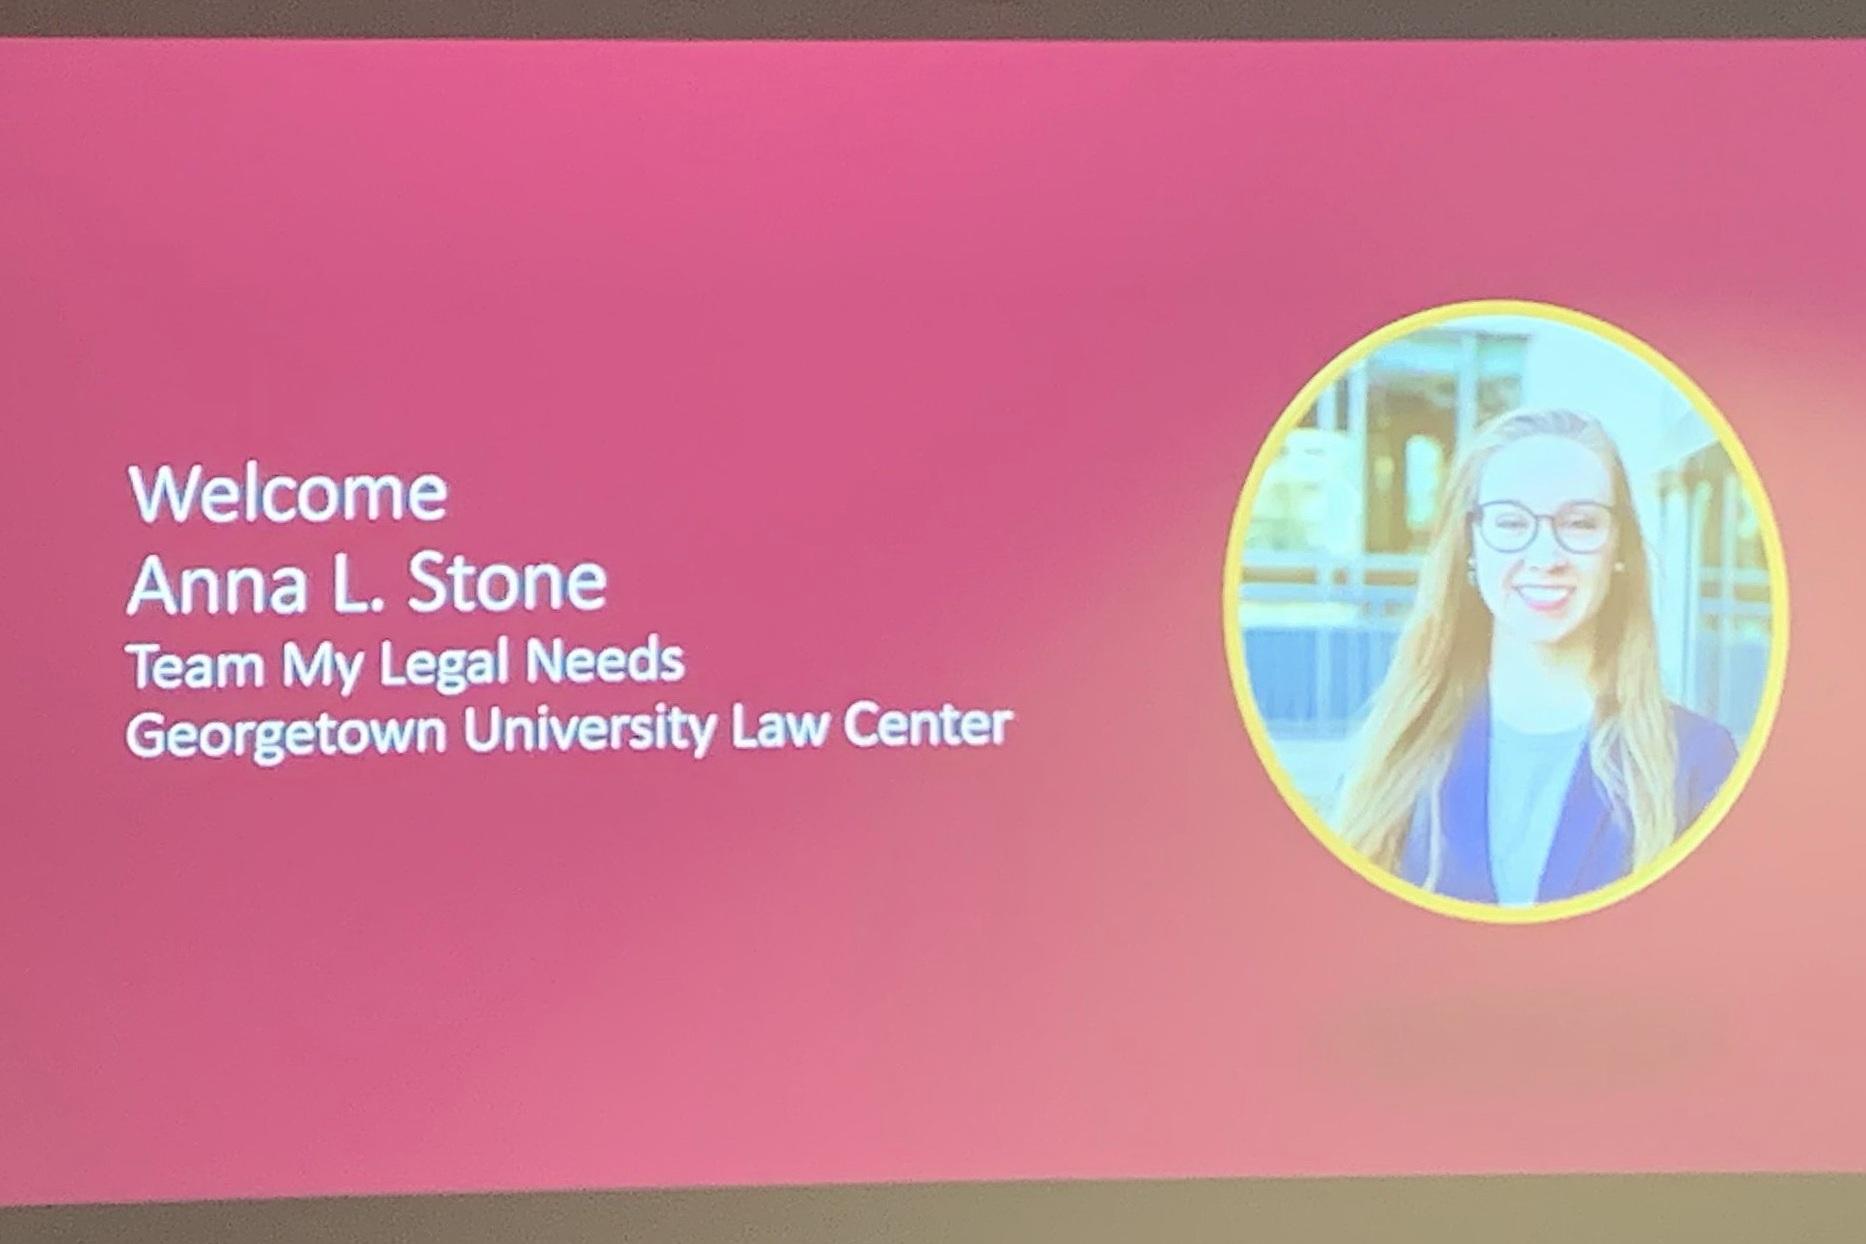 Slide announcing Anna Stone